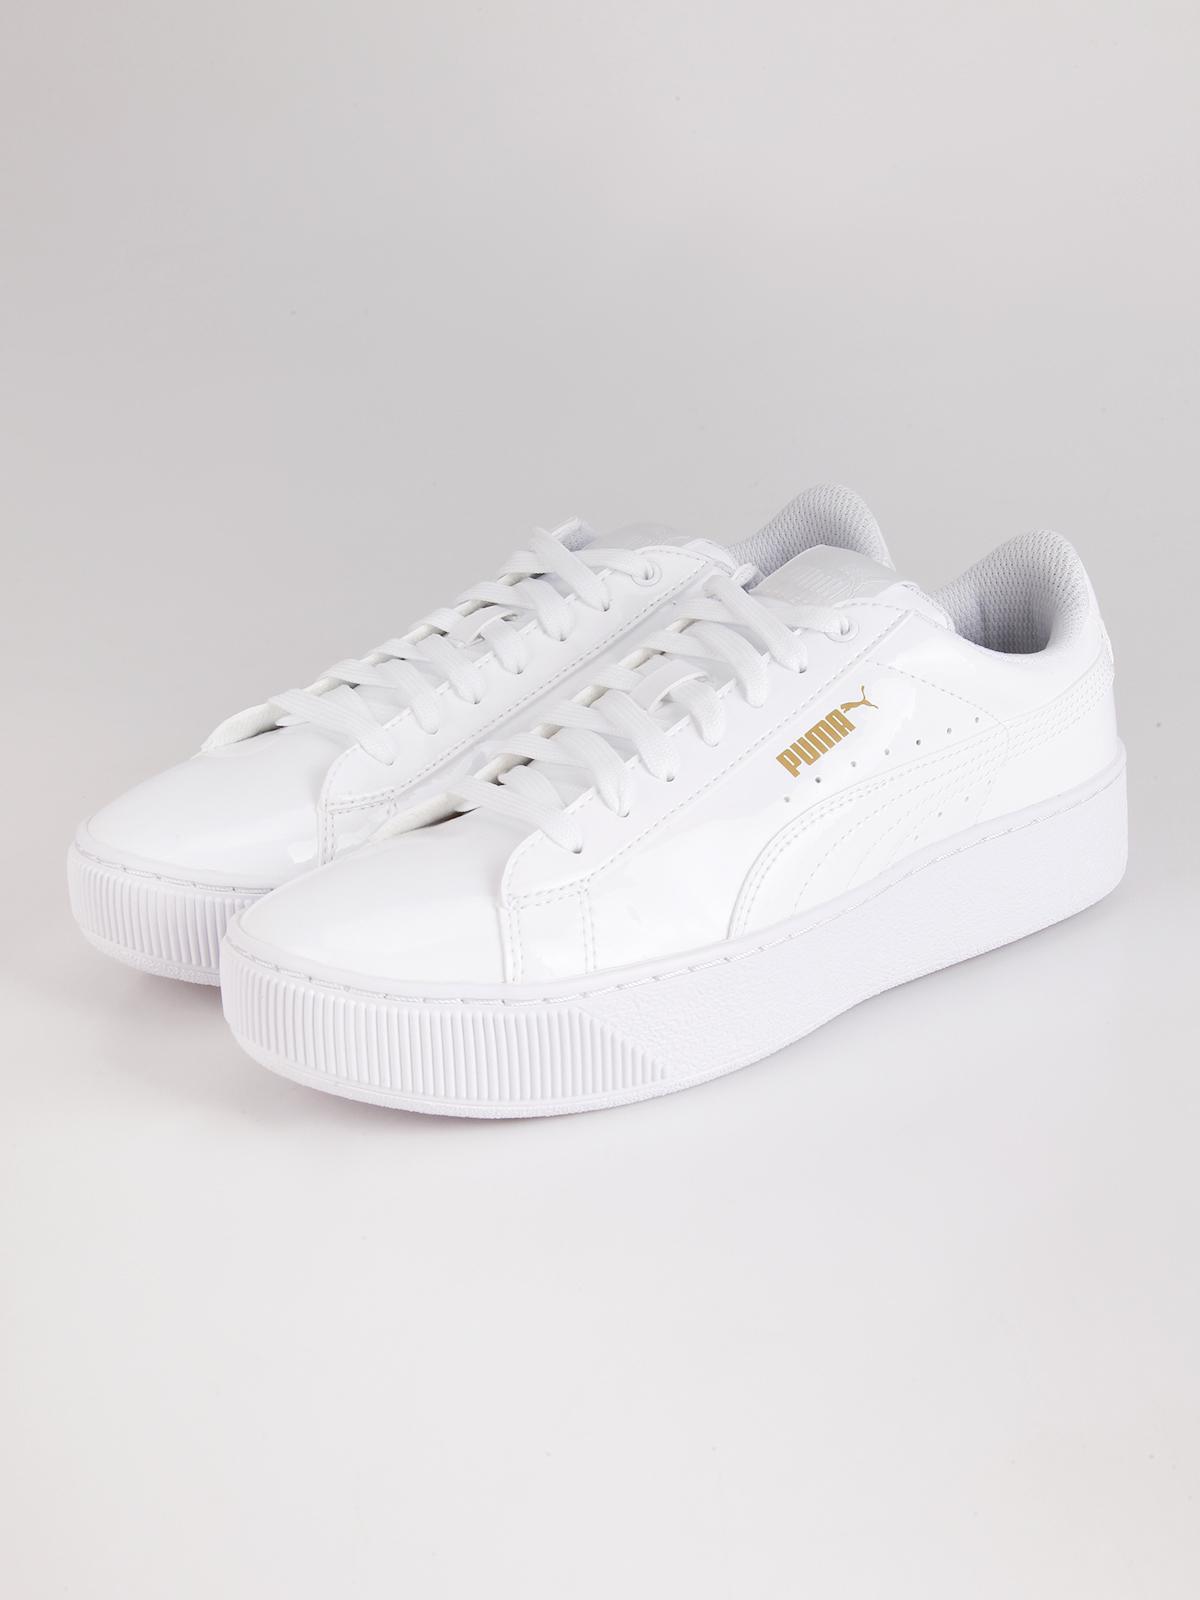 2mujer zapatos casual puma